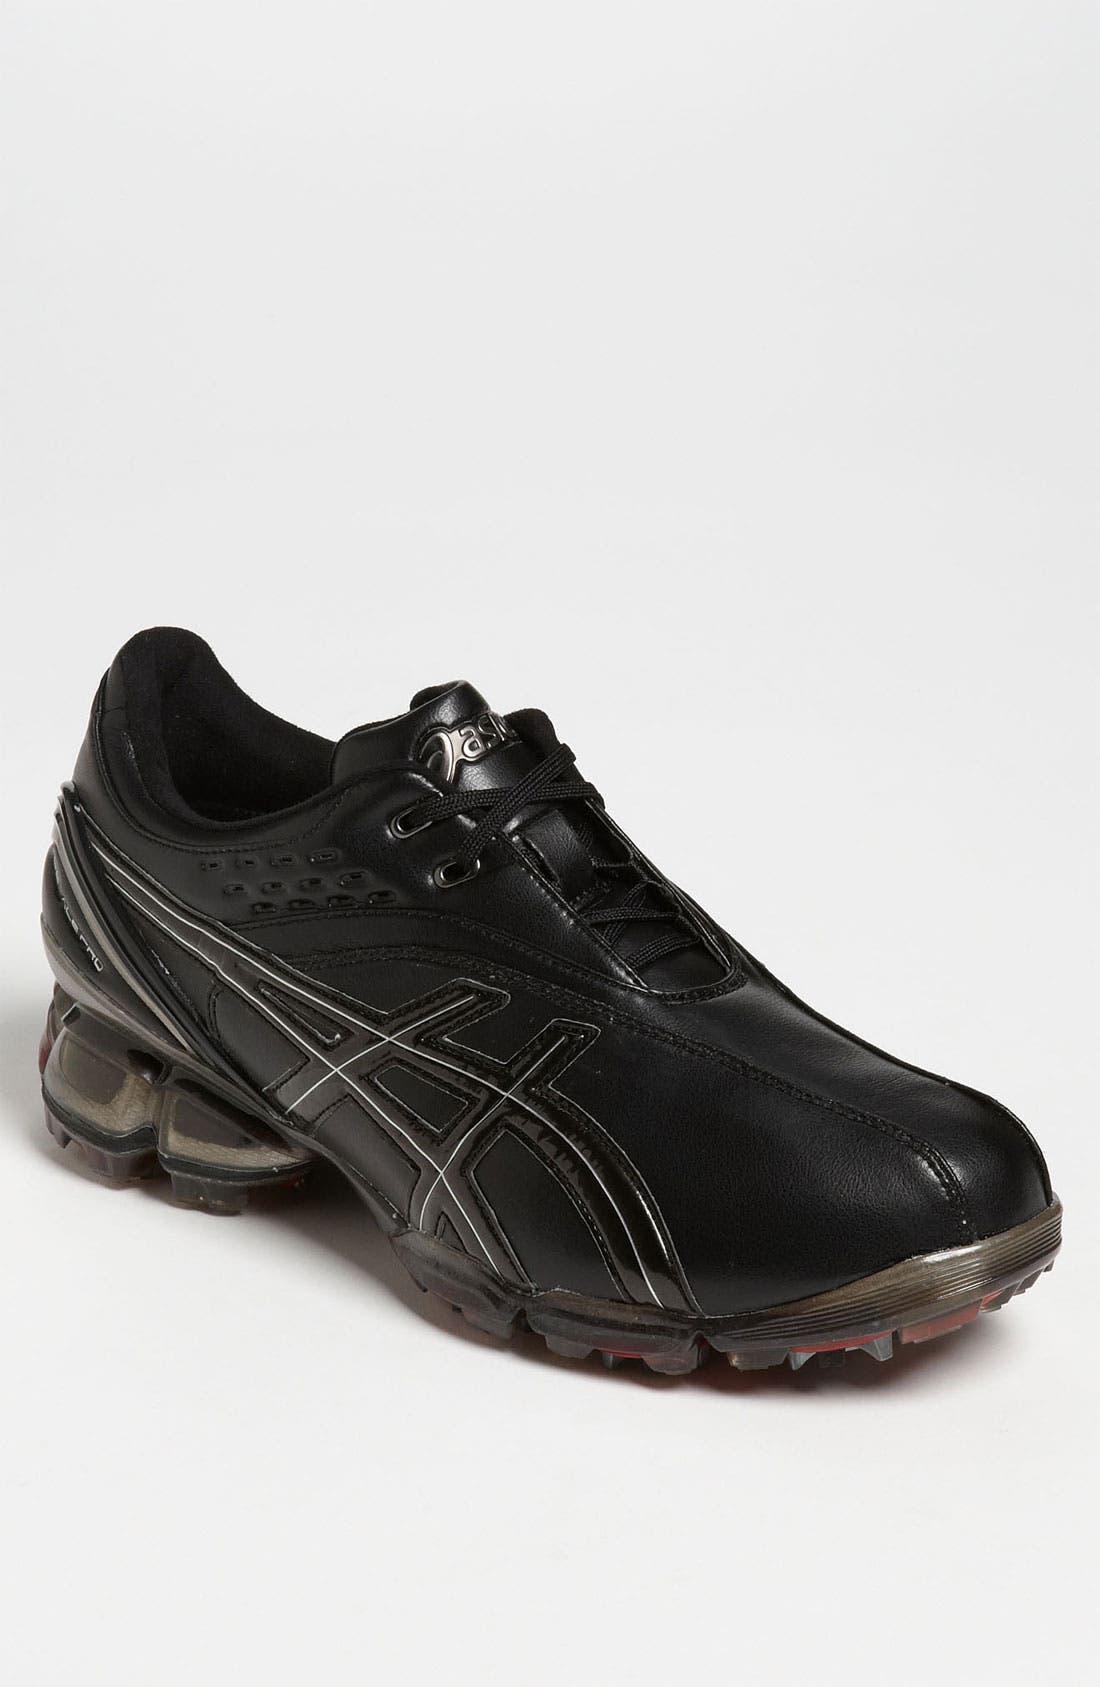 Main Image - ASICS® 'GEL-Ace Pro' Golf Shoe (Men)